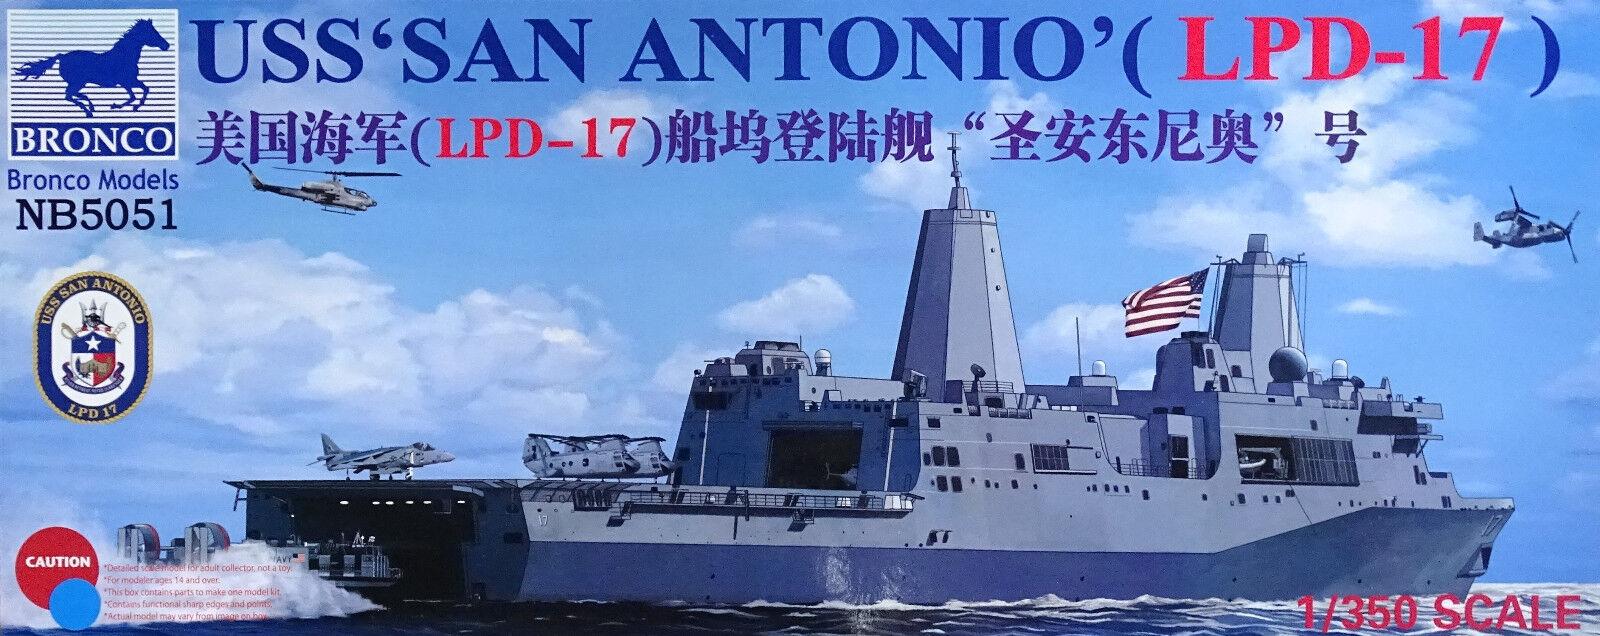 BRONCO NB5051 USS San Antonio LPD-17 in 1 350  | Günstige